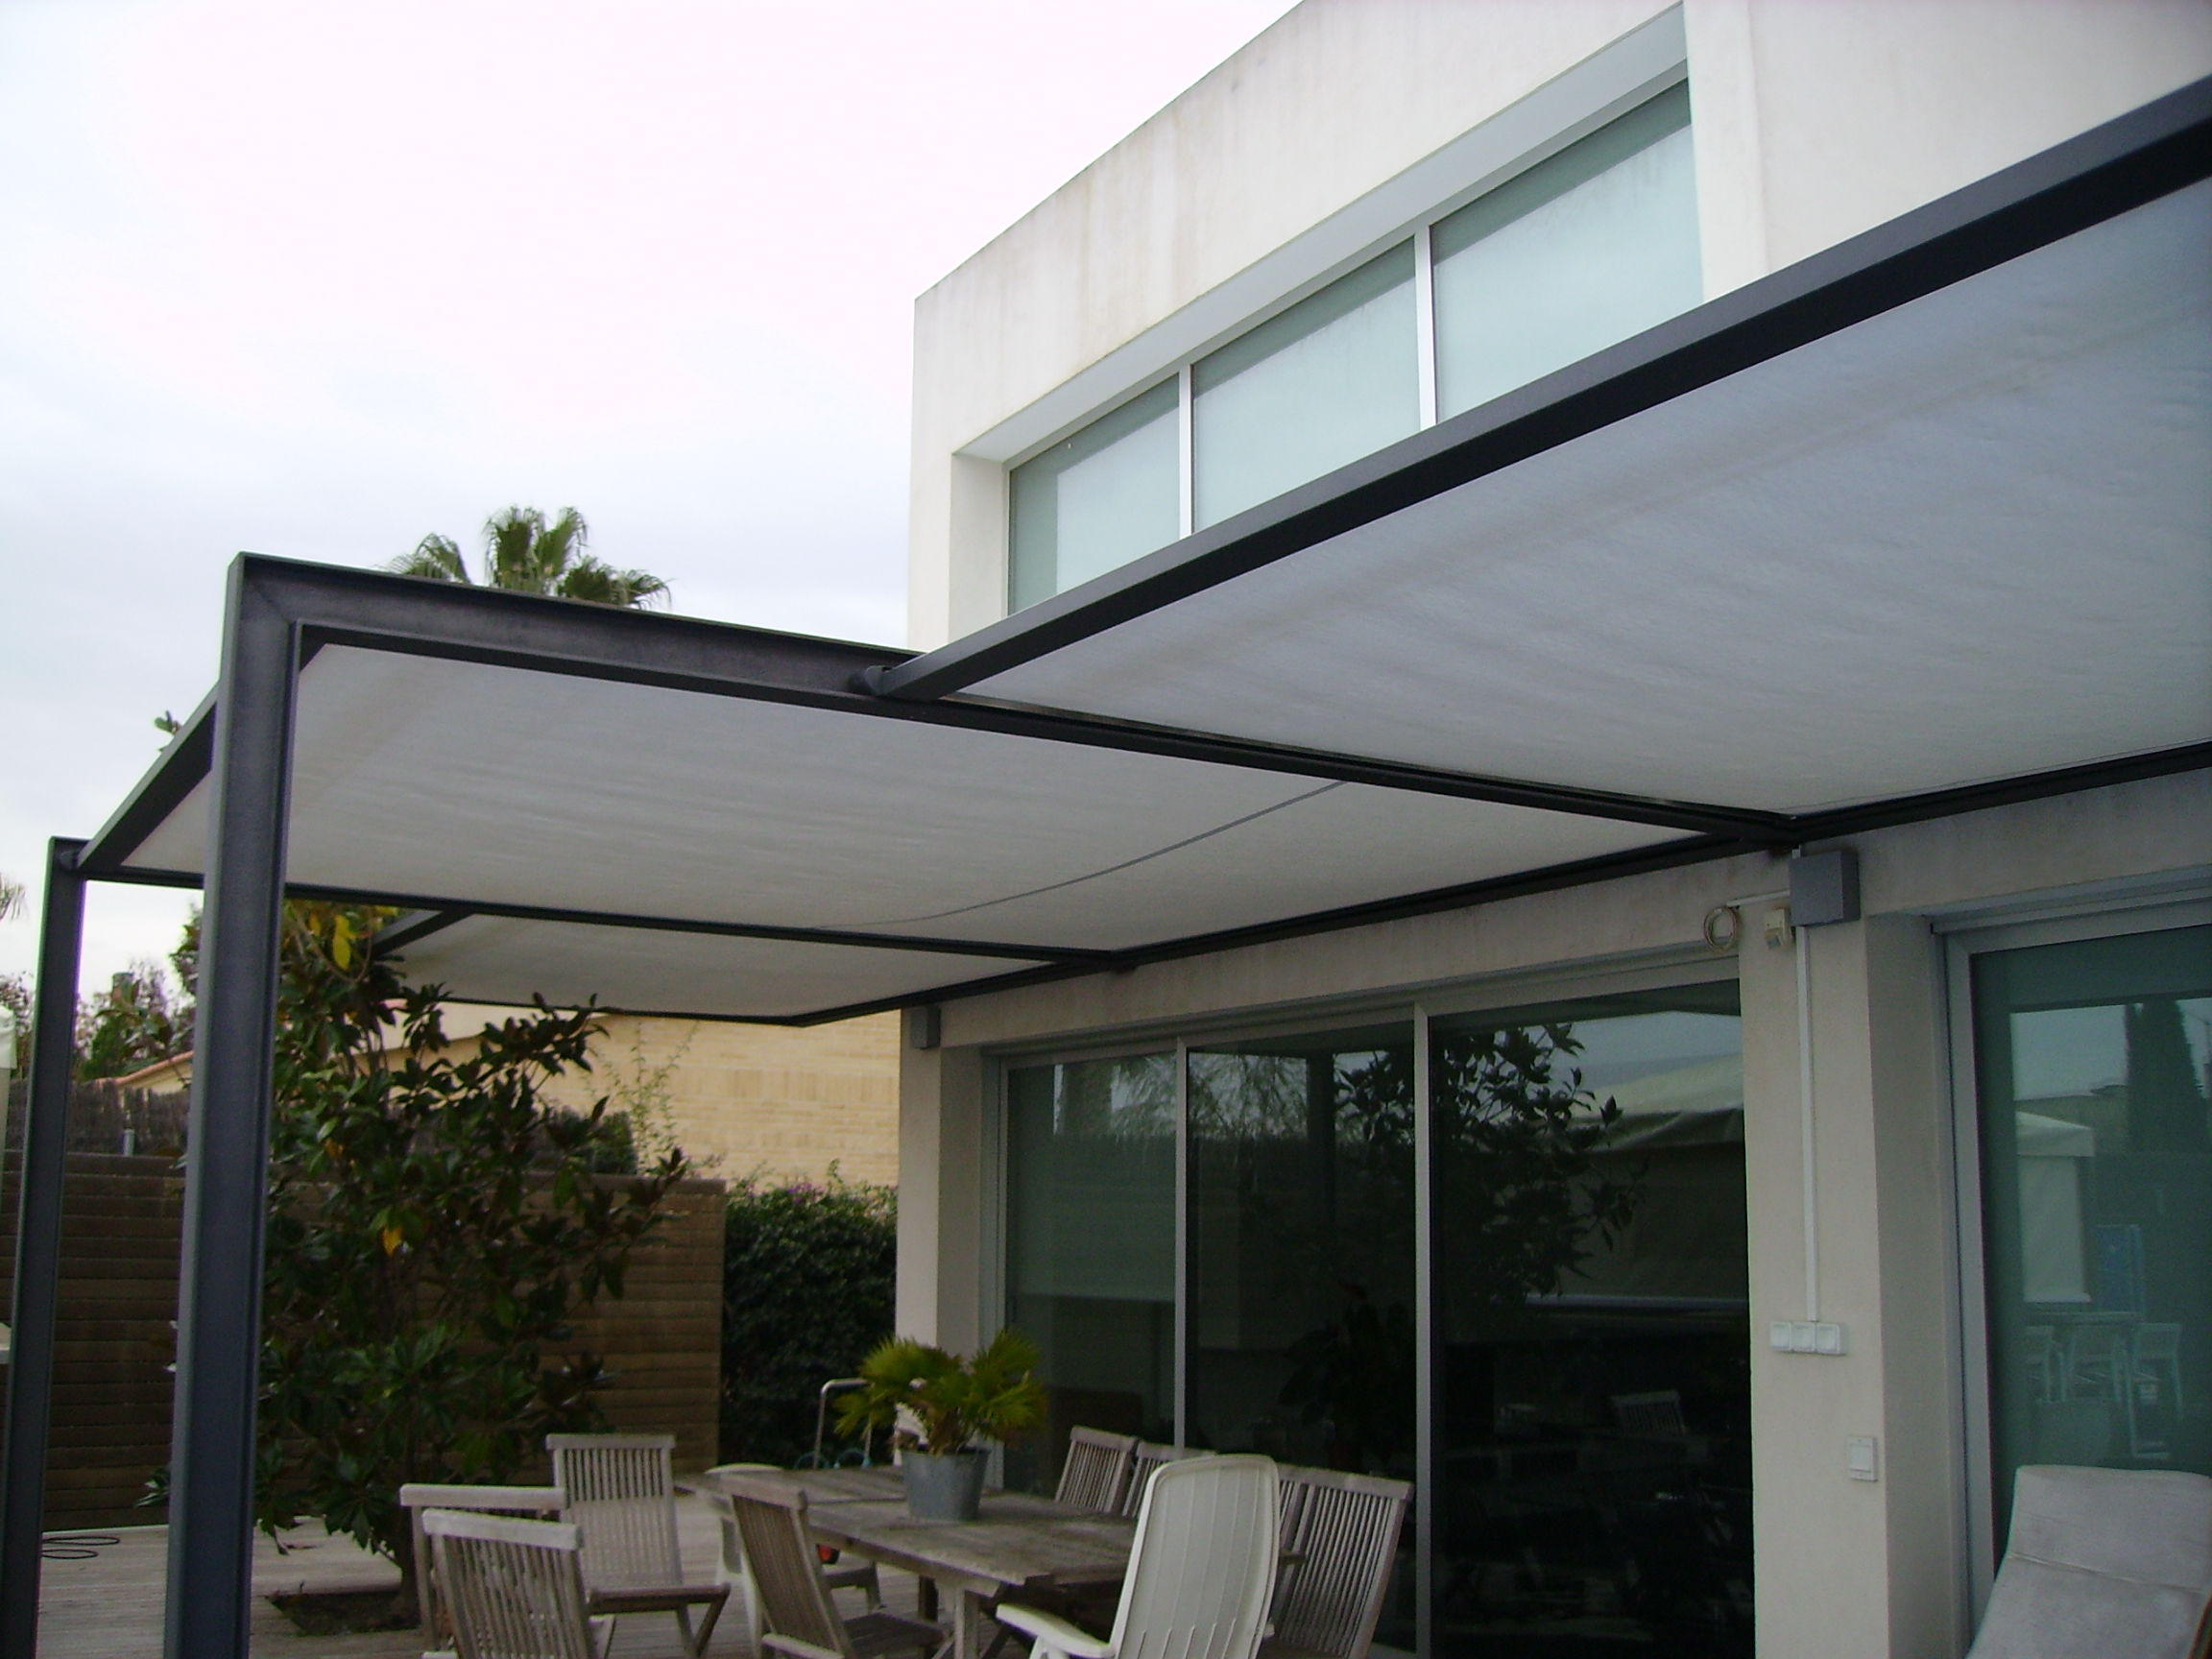 7 toldos para cubrir veranda acristaladas cat logo de for Perfiles de aluminio para toldos de palilleria